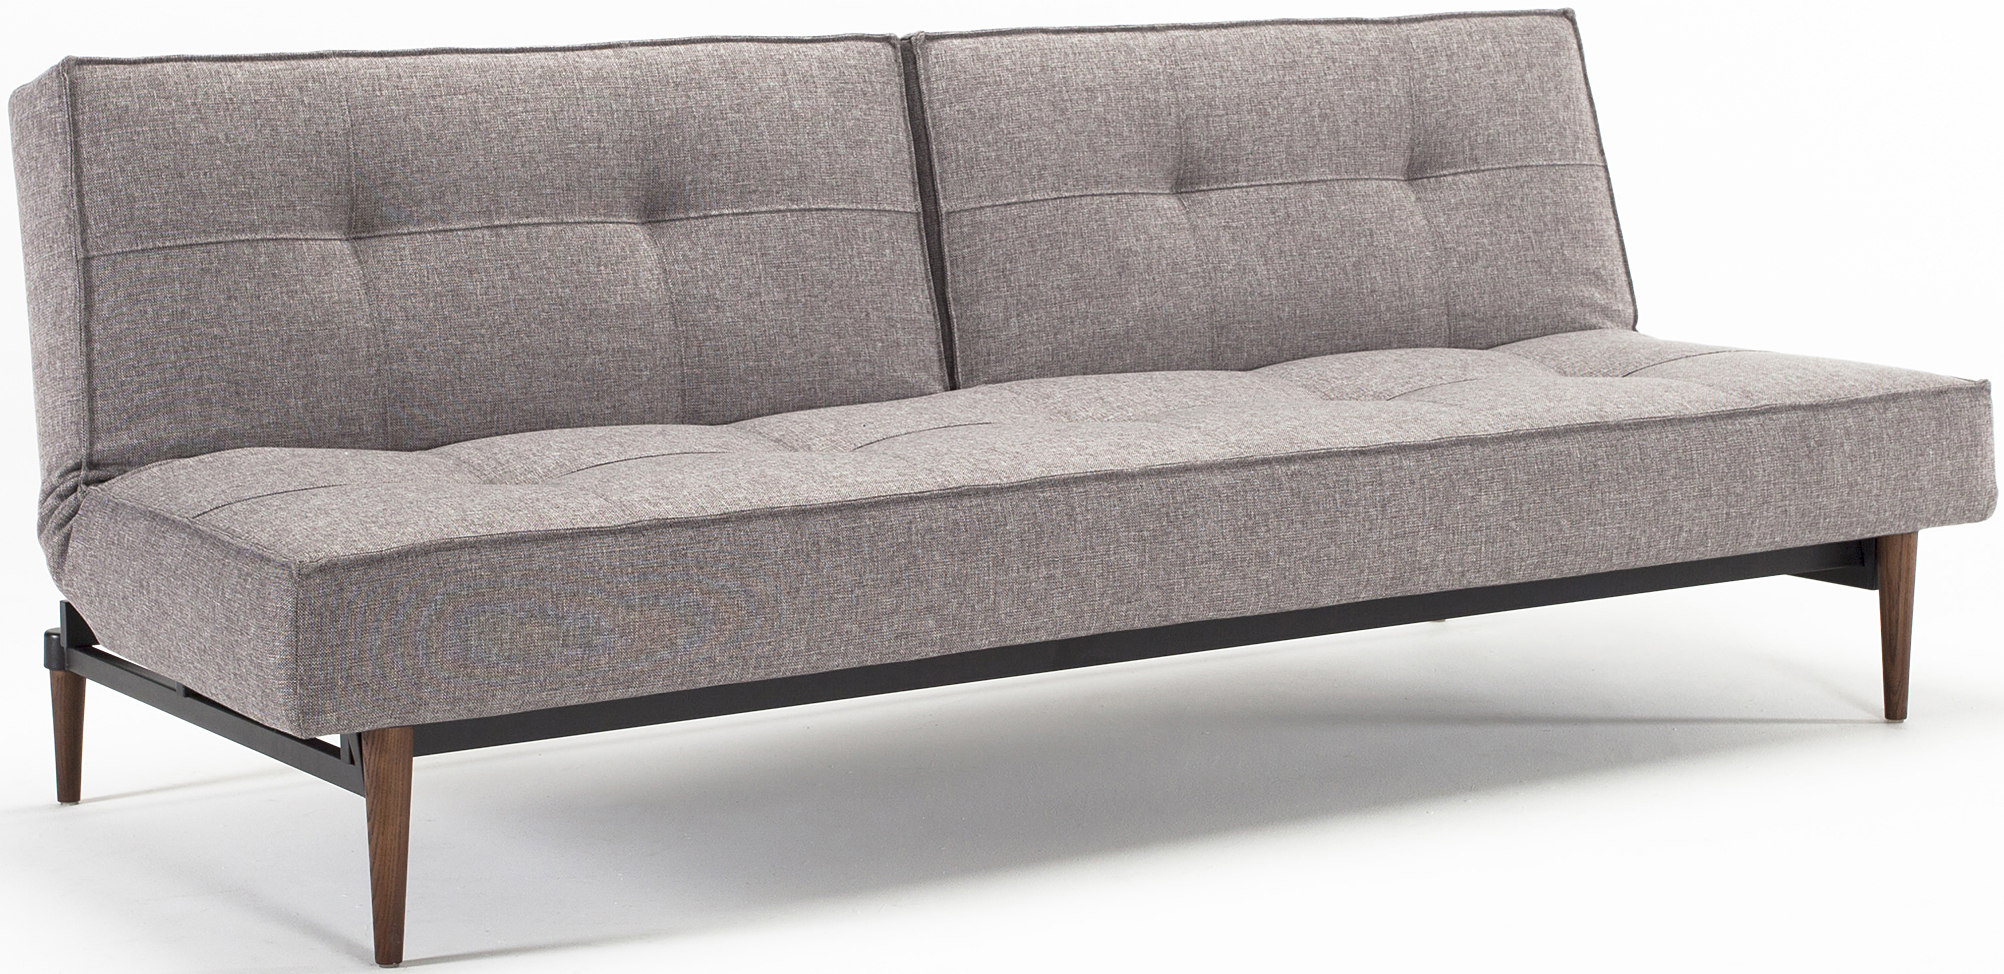 the innovation living splitback sofa